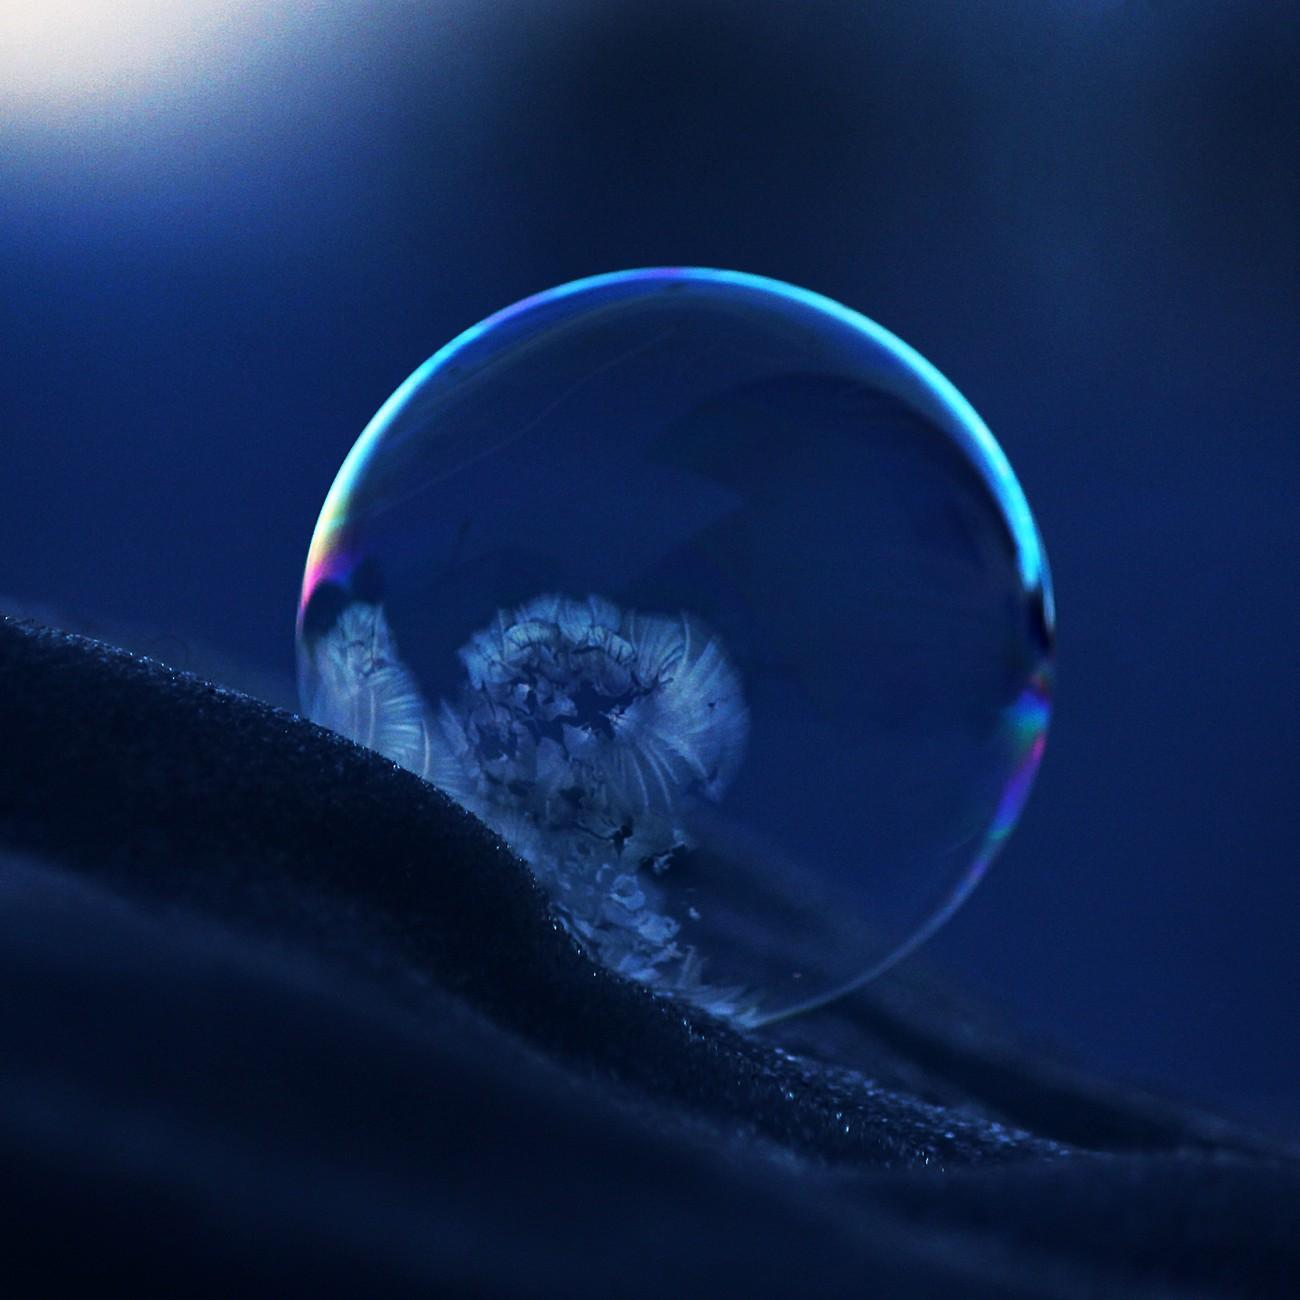 Bubble at Night